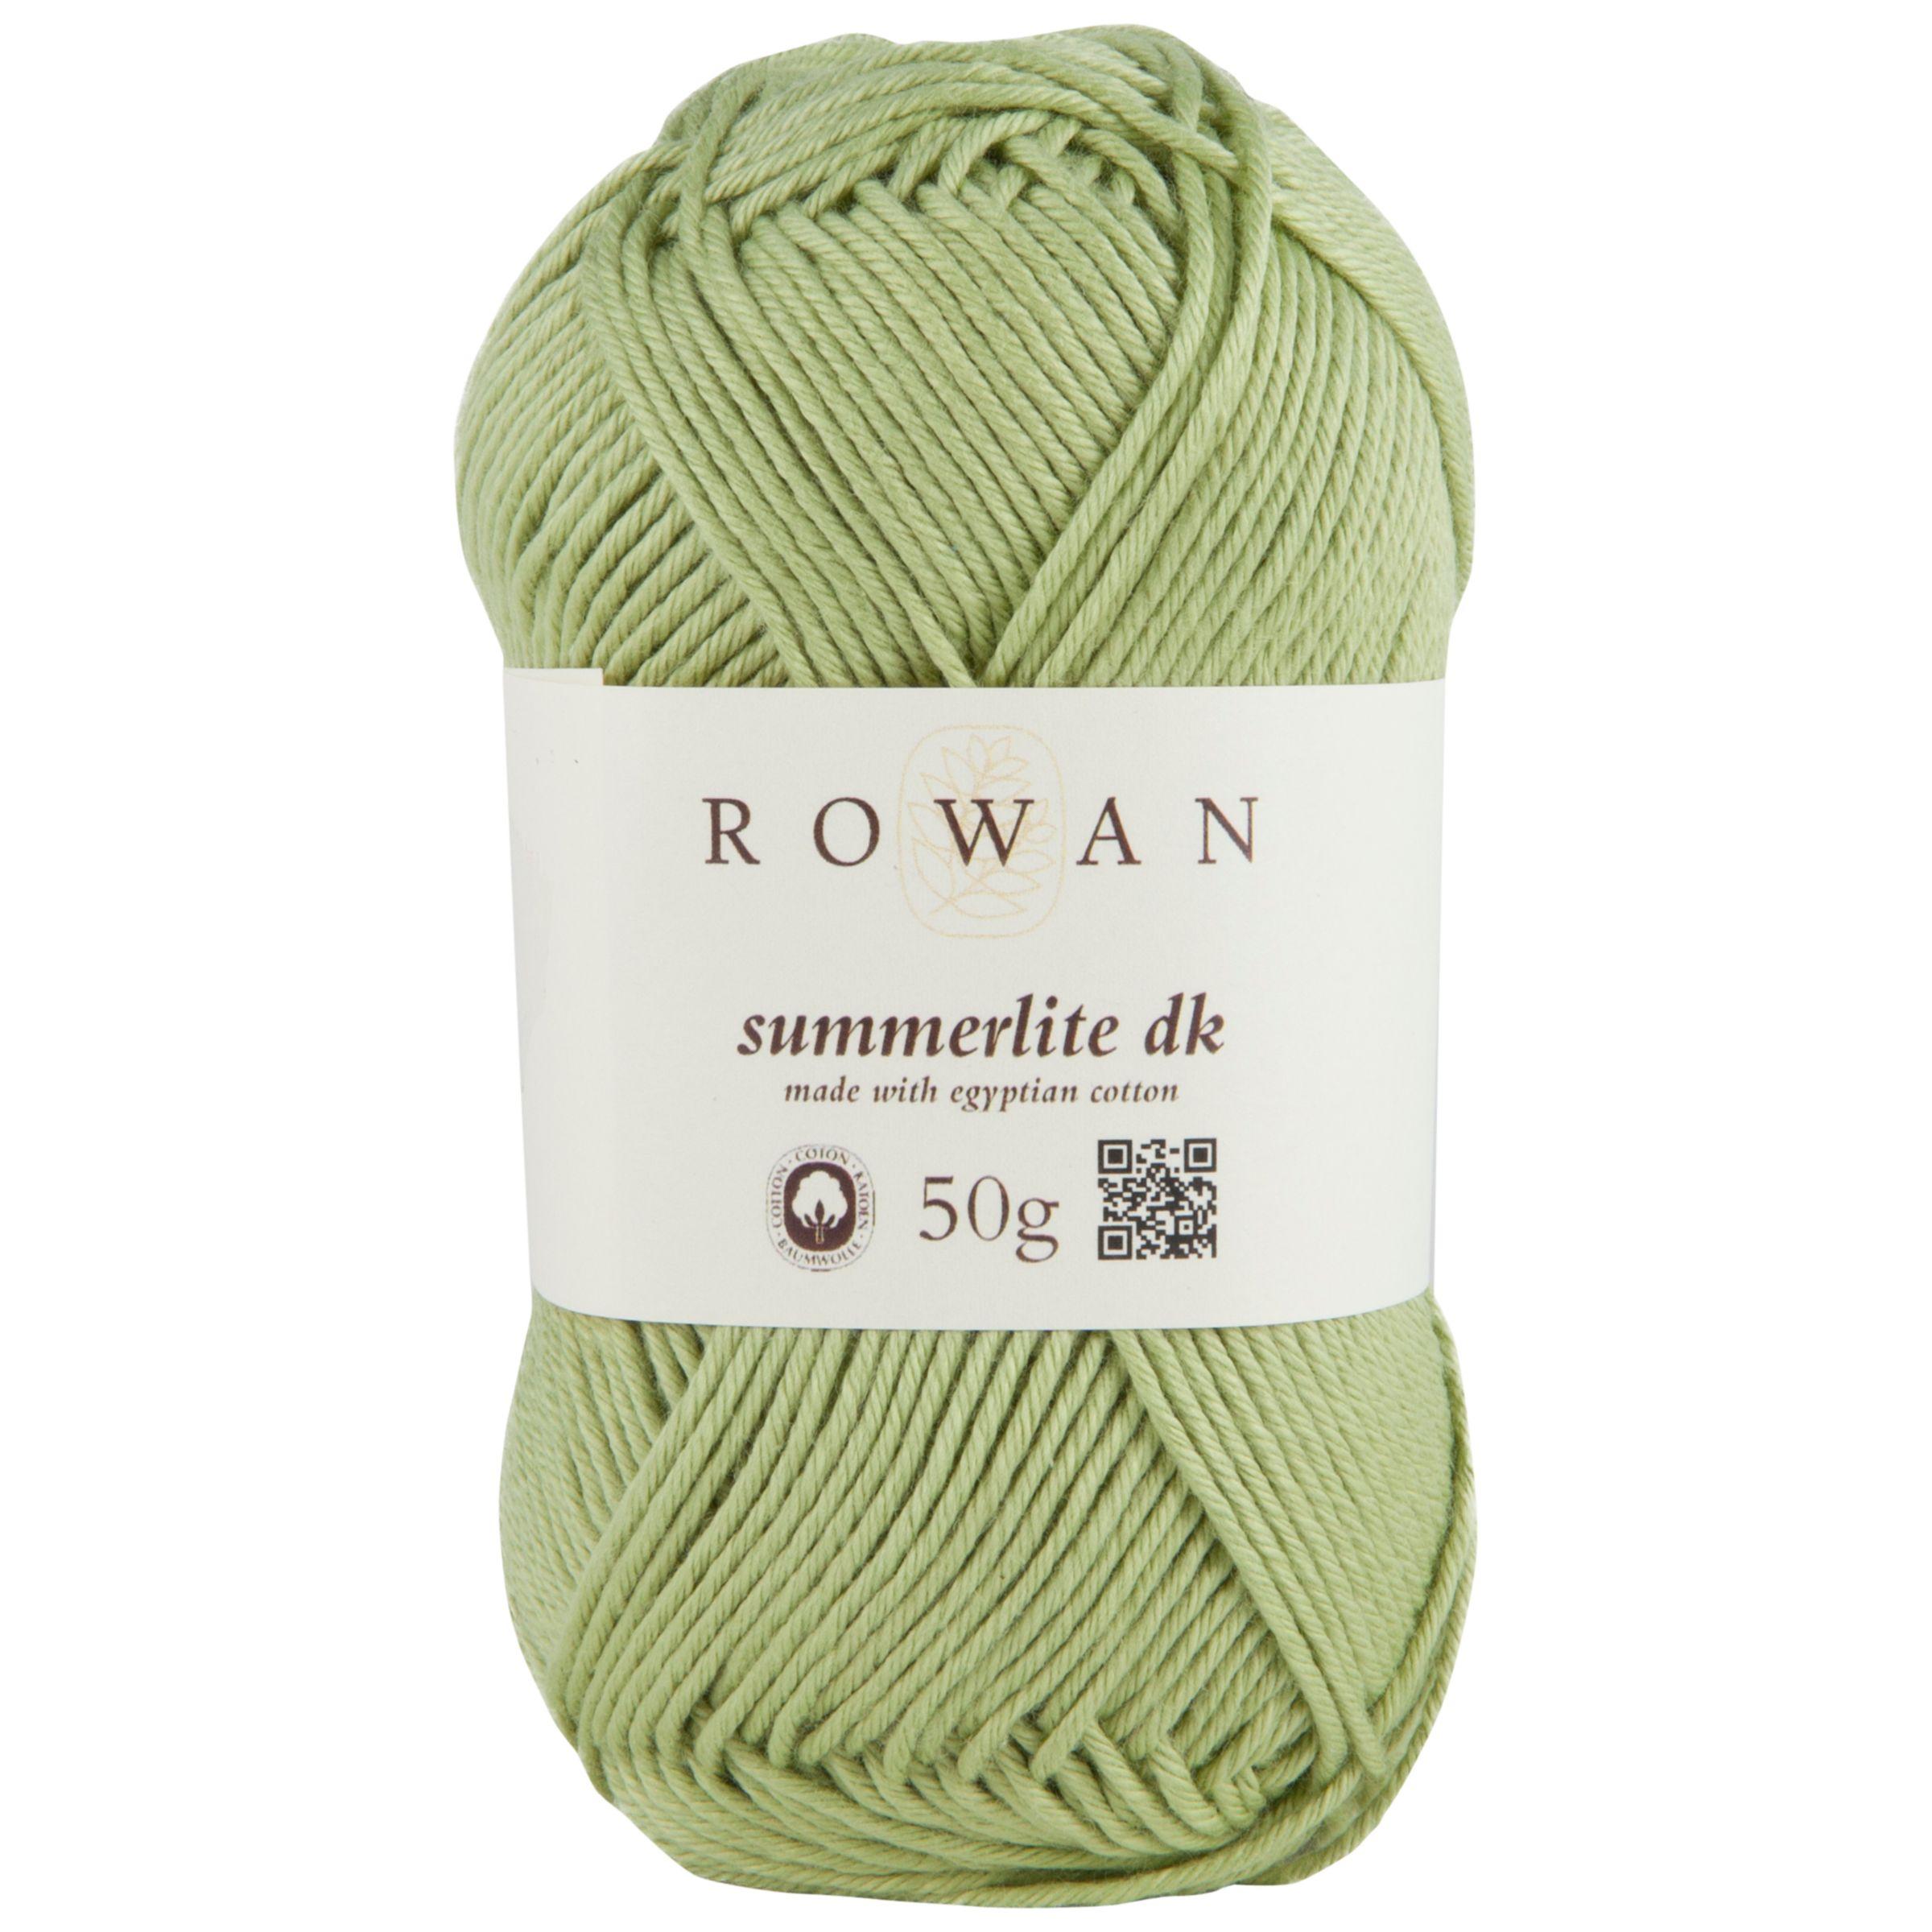 Rowan Rowan Summerlite DK Yarn, 50g